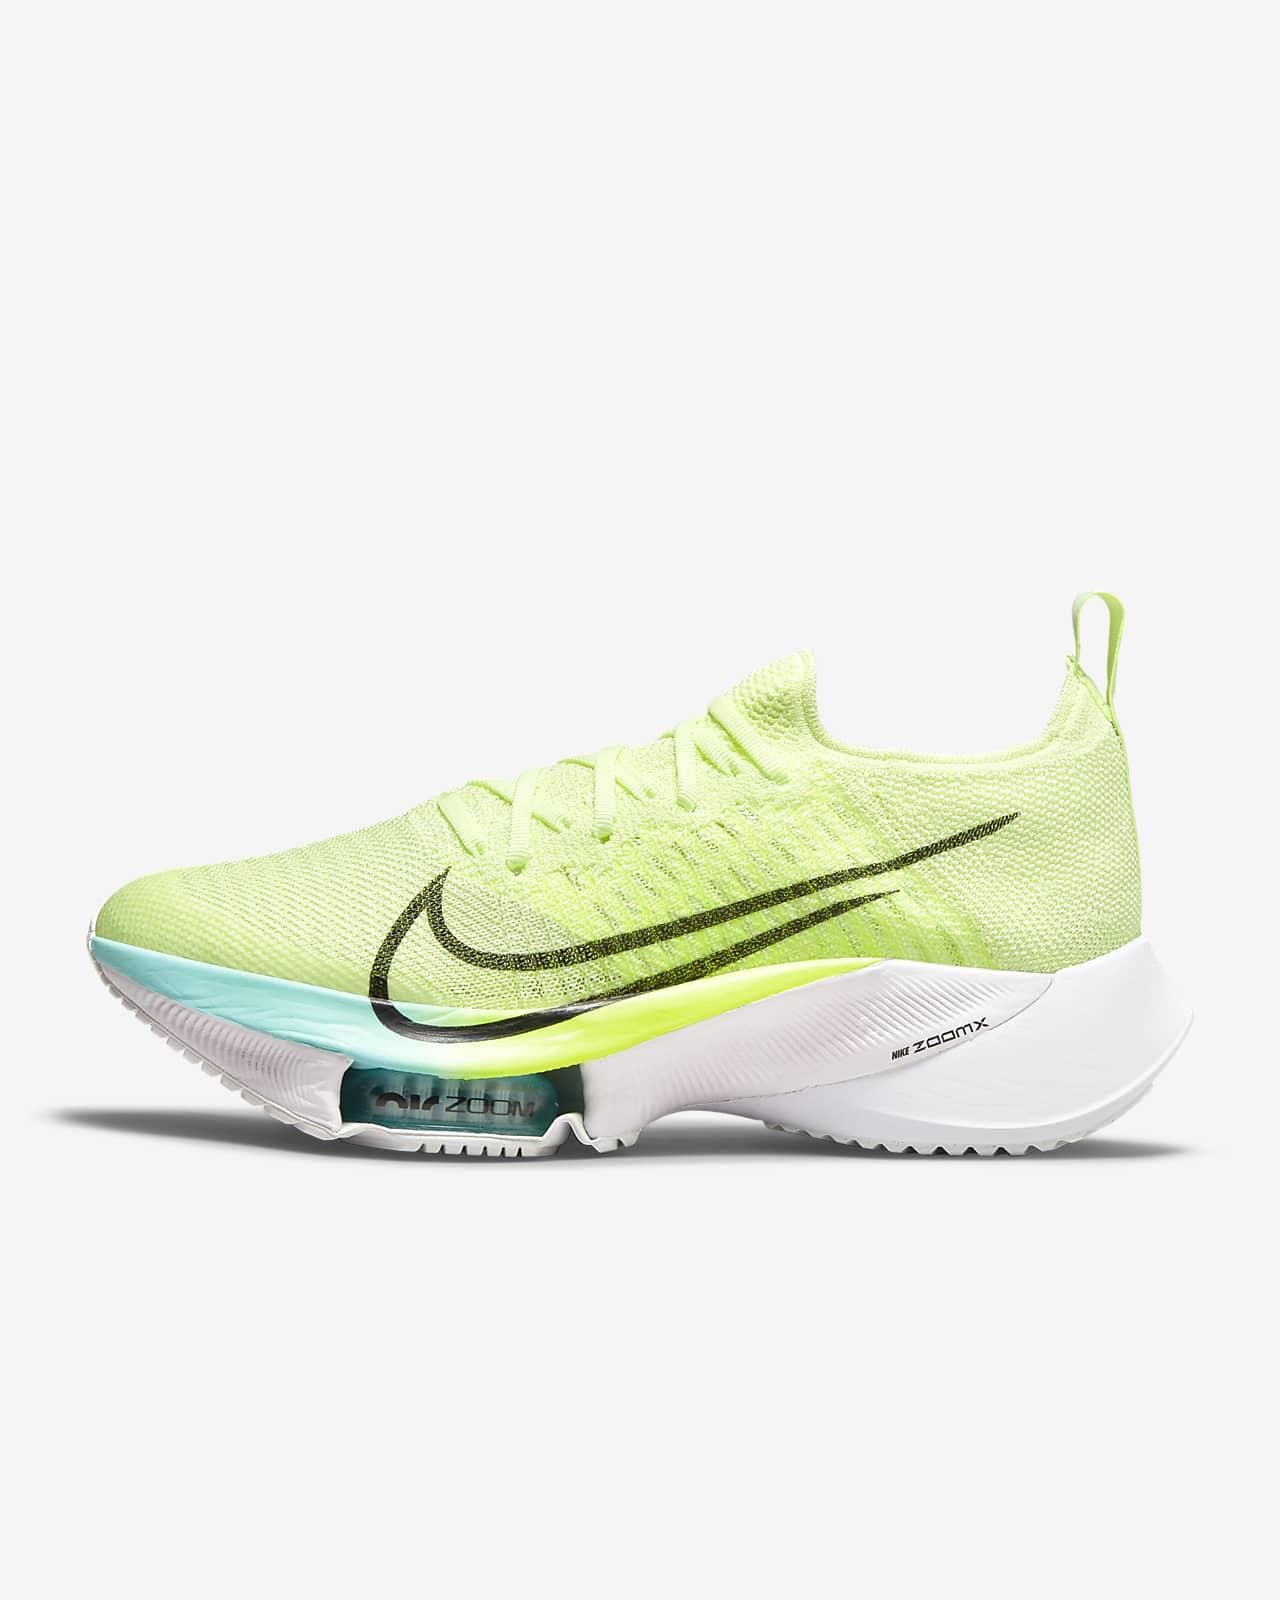 Nike Air Zoom Tempo NEXT% Sabatilles de running de carretera - Dona